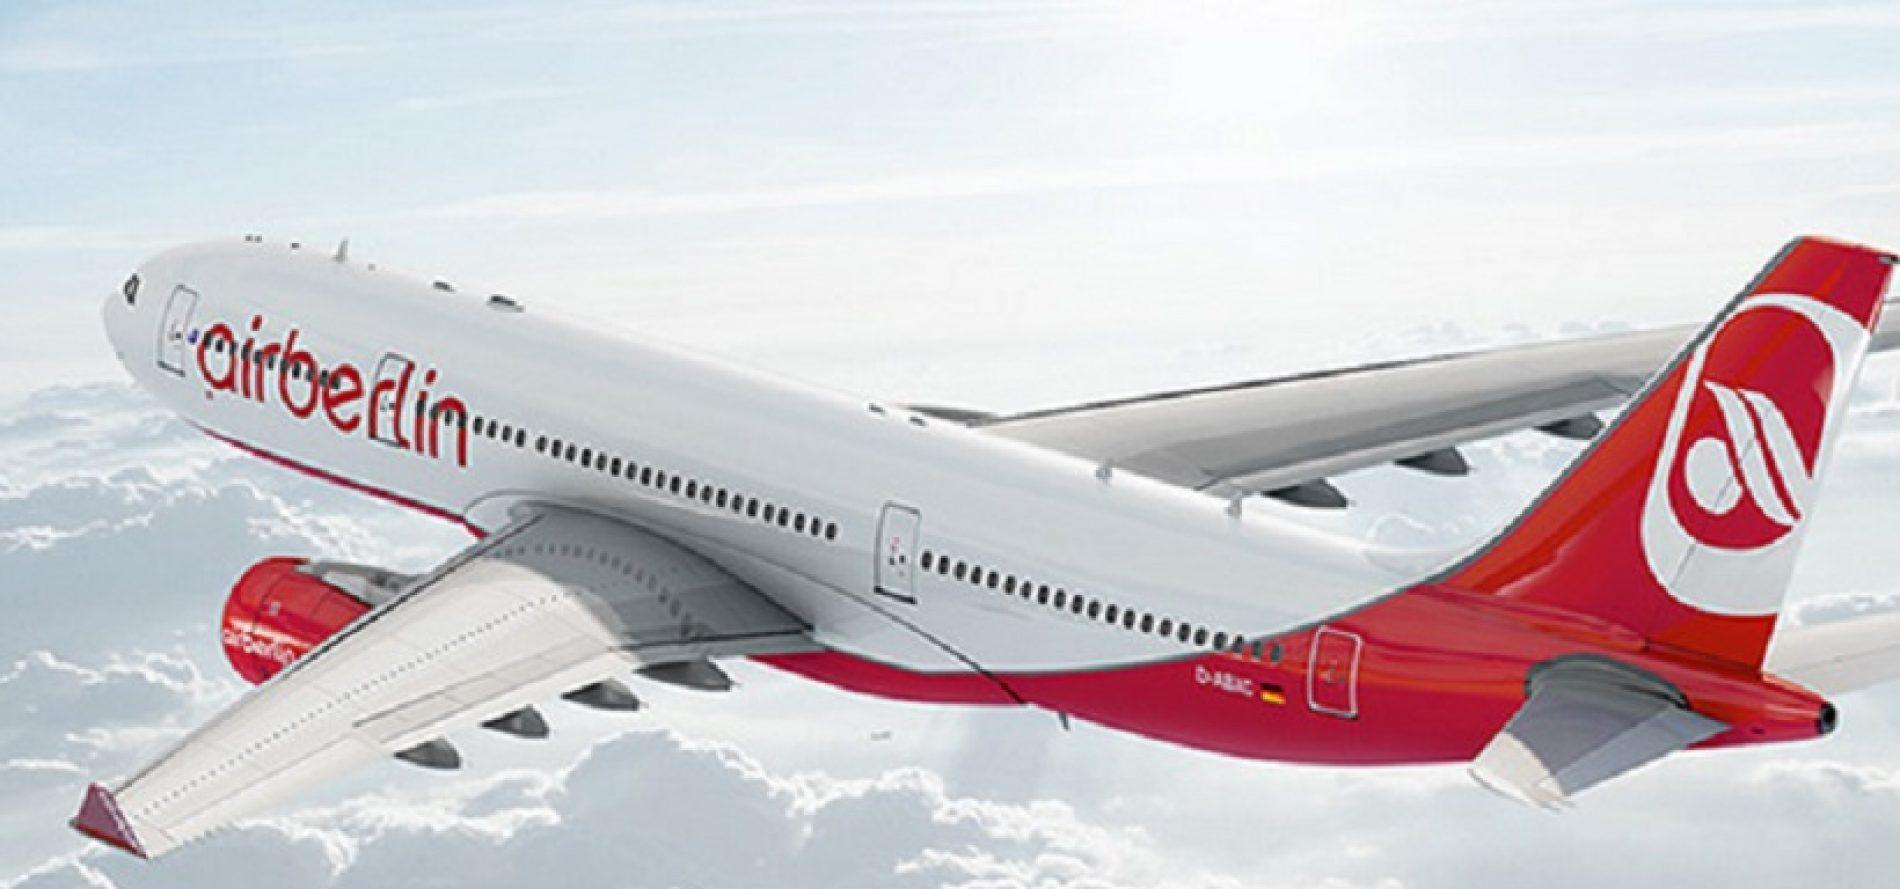 AirBerlin: Rekordan gubitak zbog troškova restrukturiranja